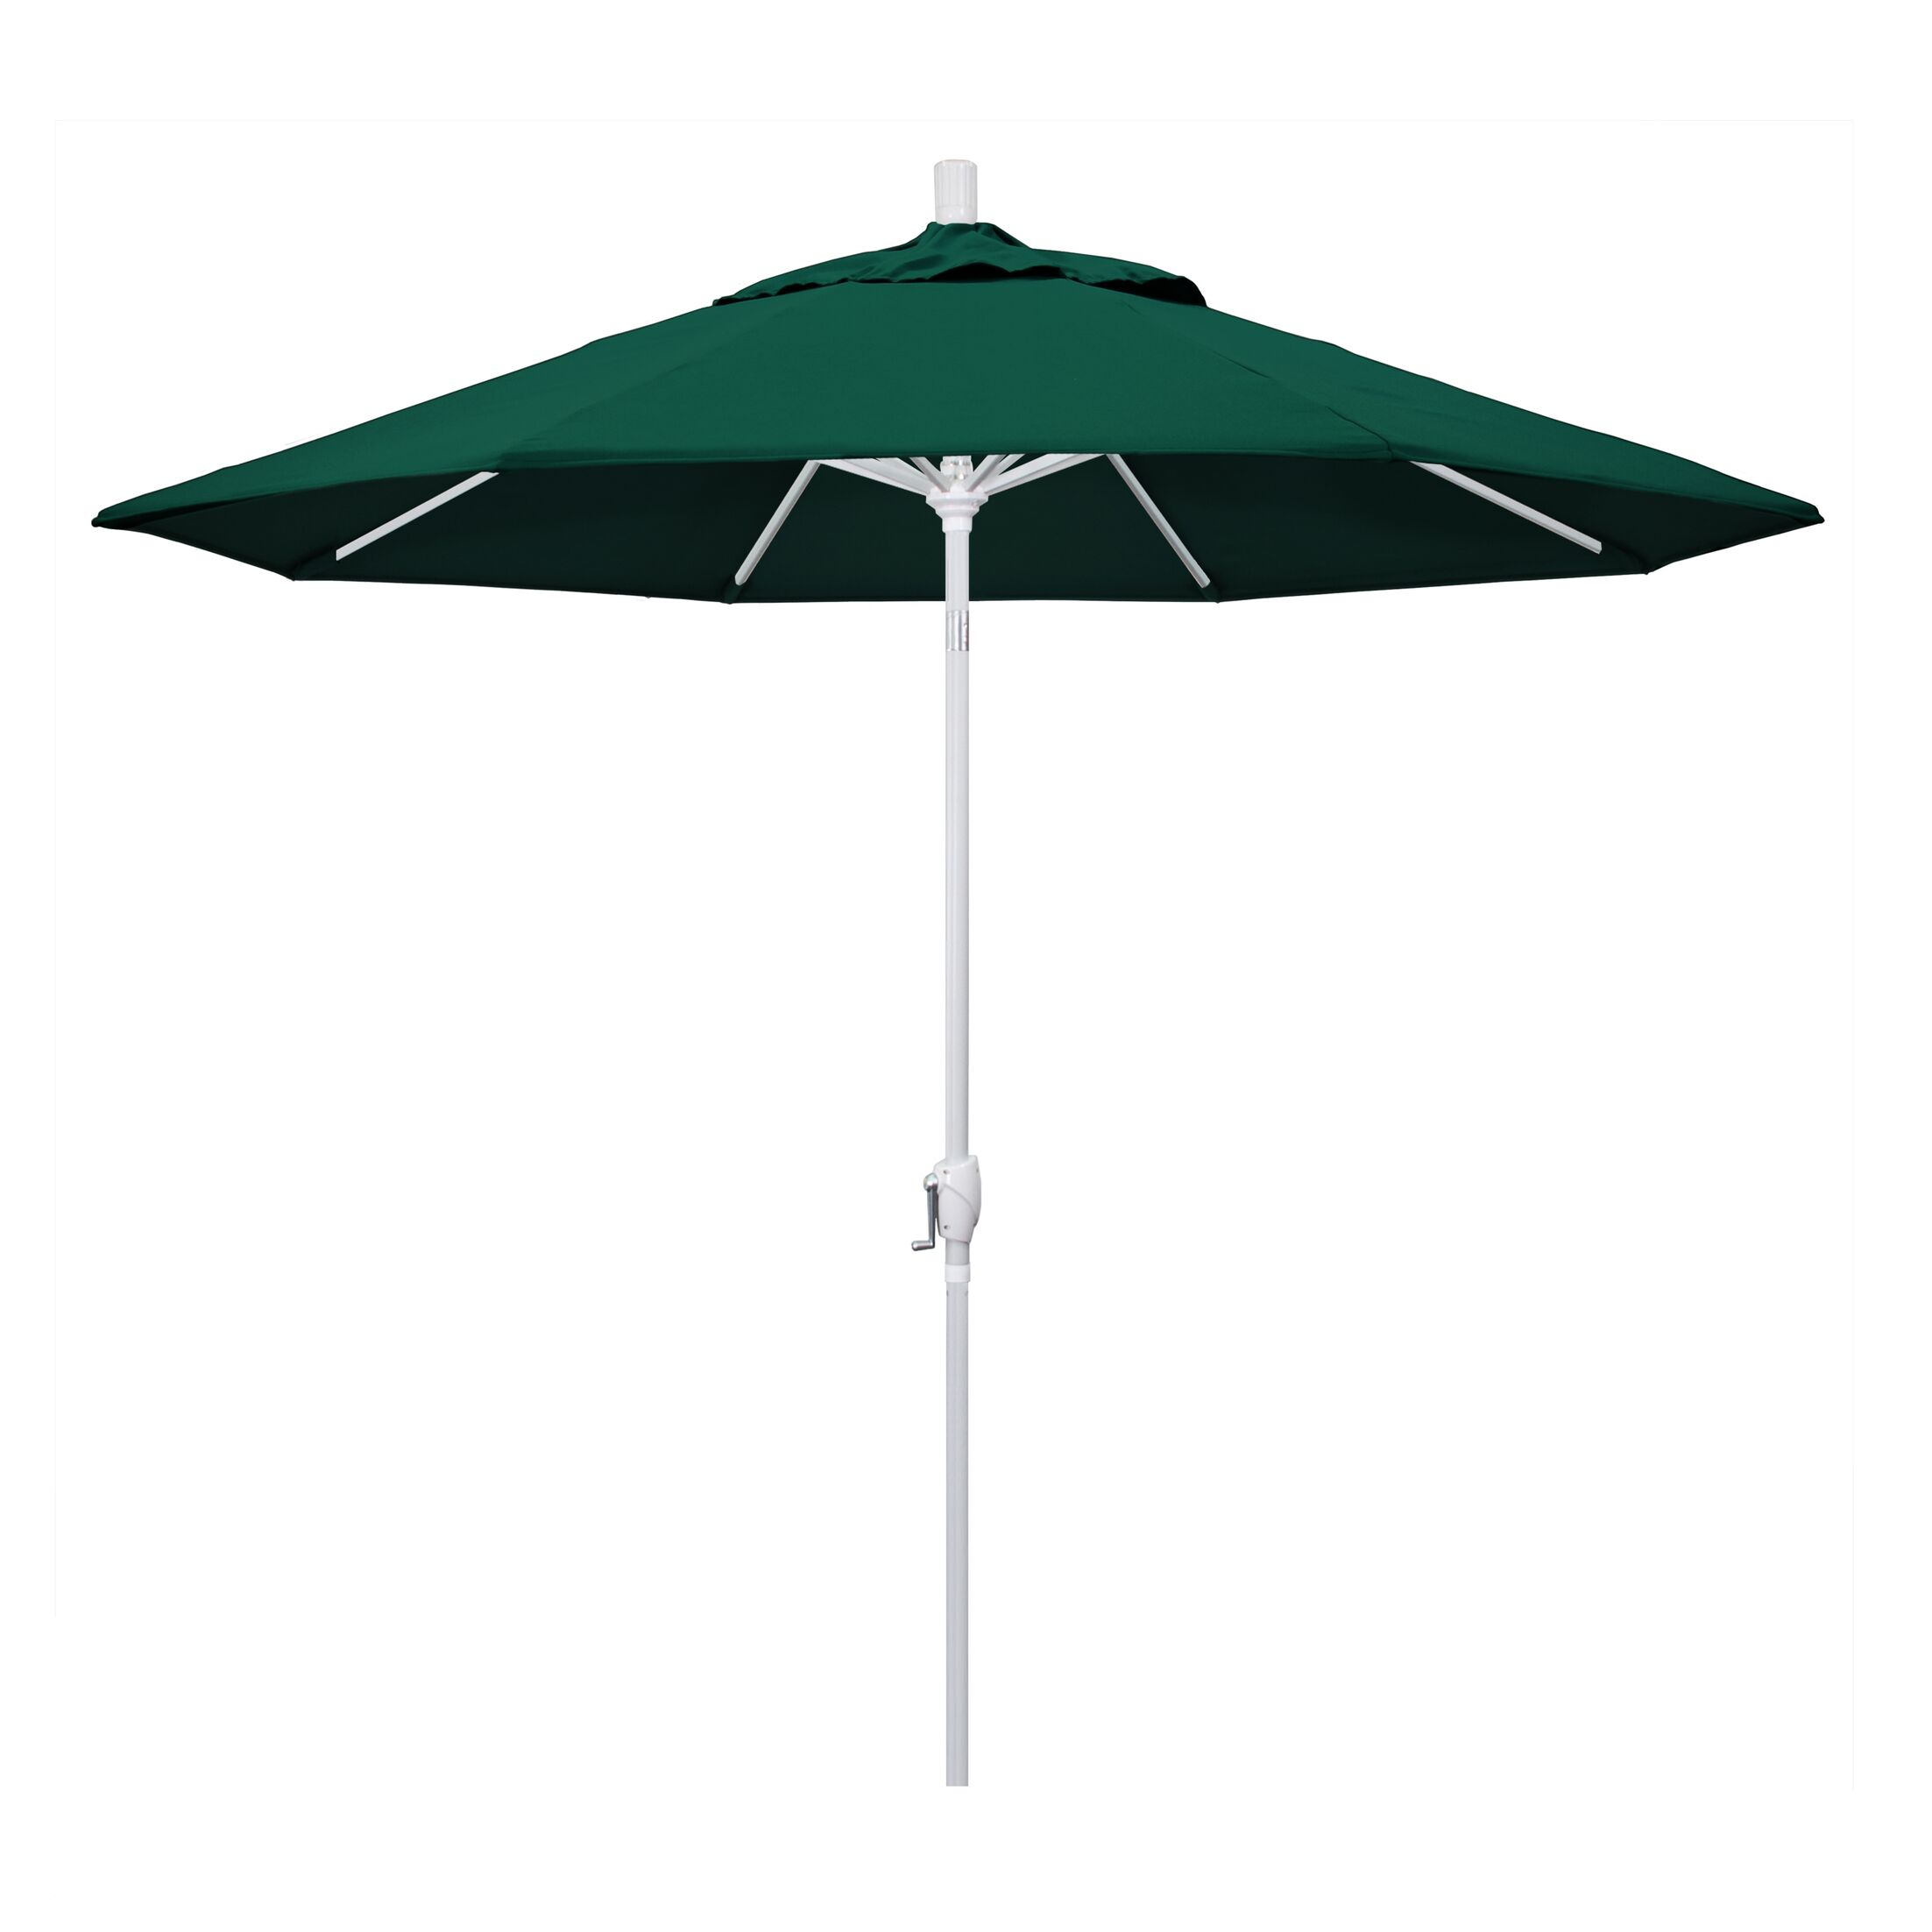 Cello 9' Market Umbrella Frame Finish: Matted White, Fabric: Forest Green